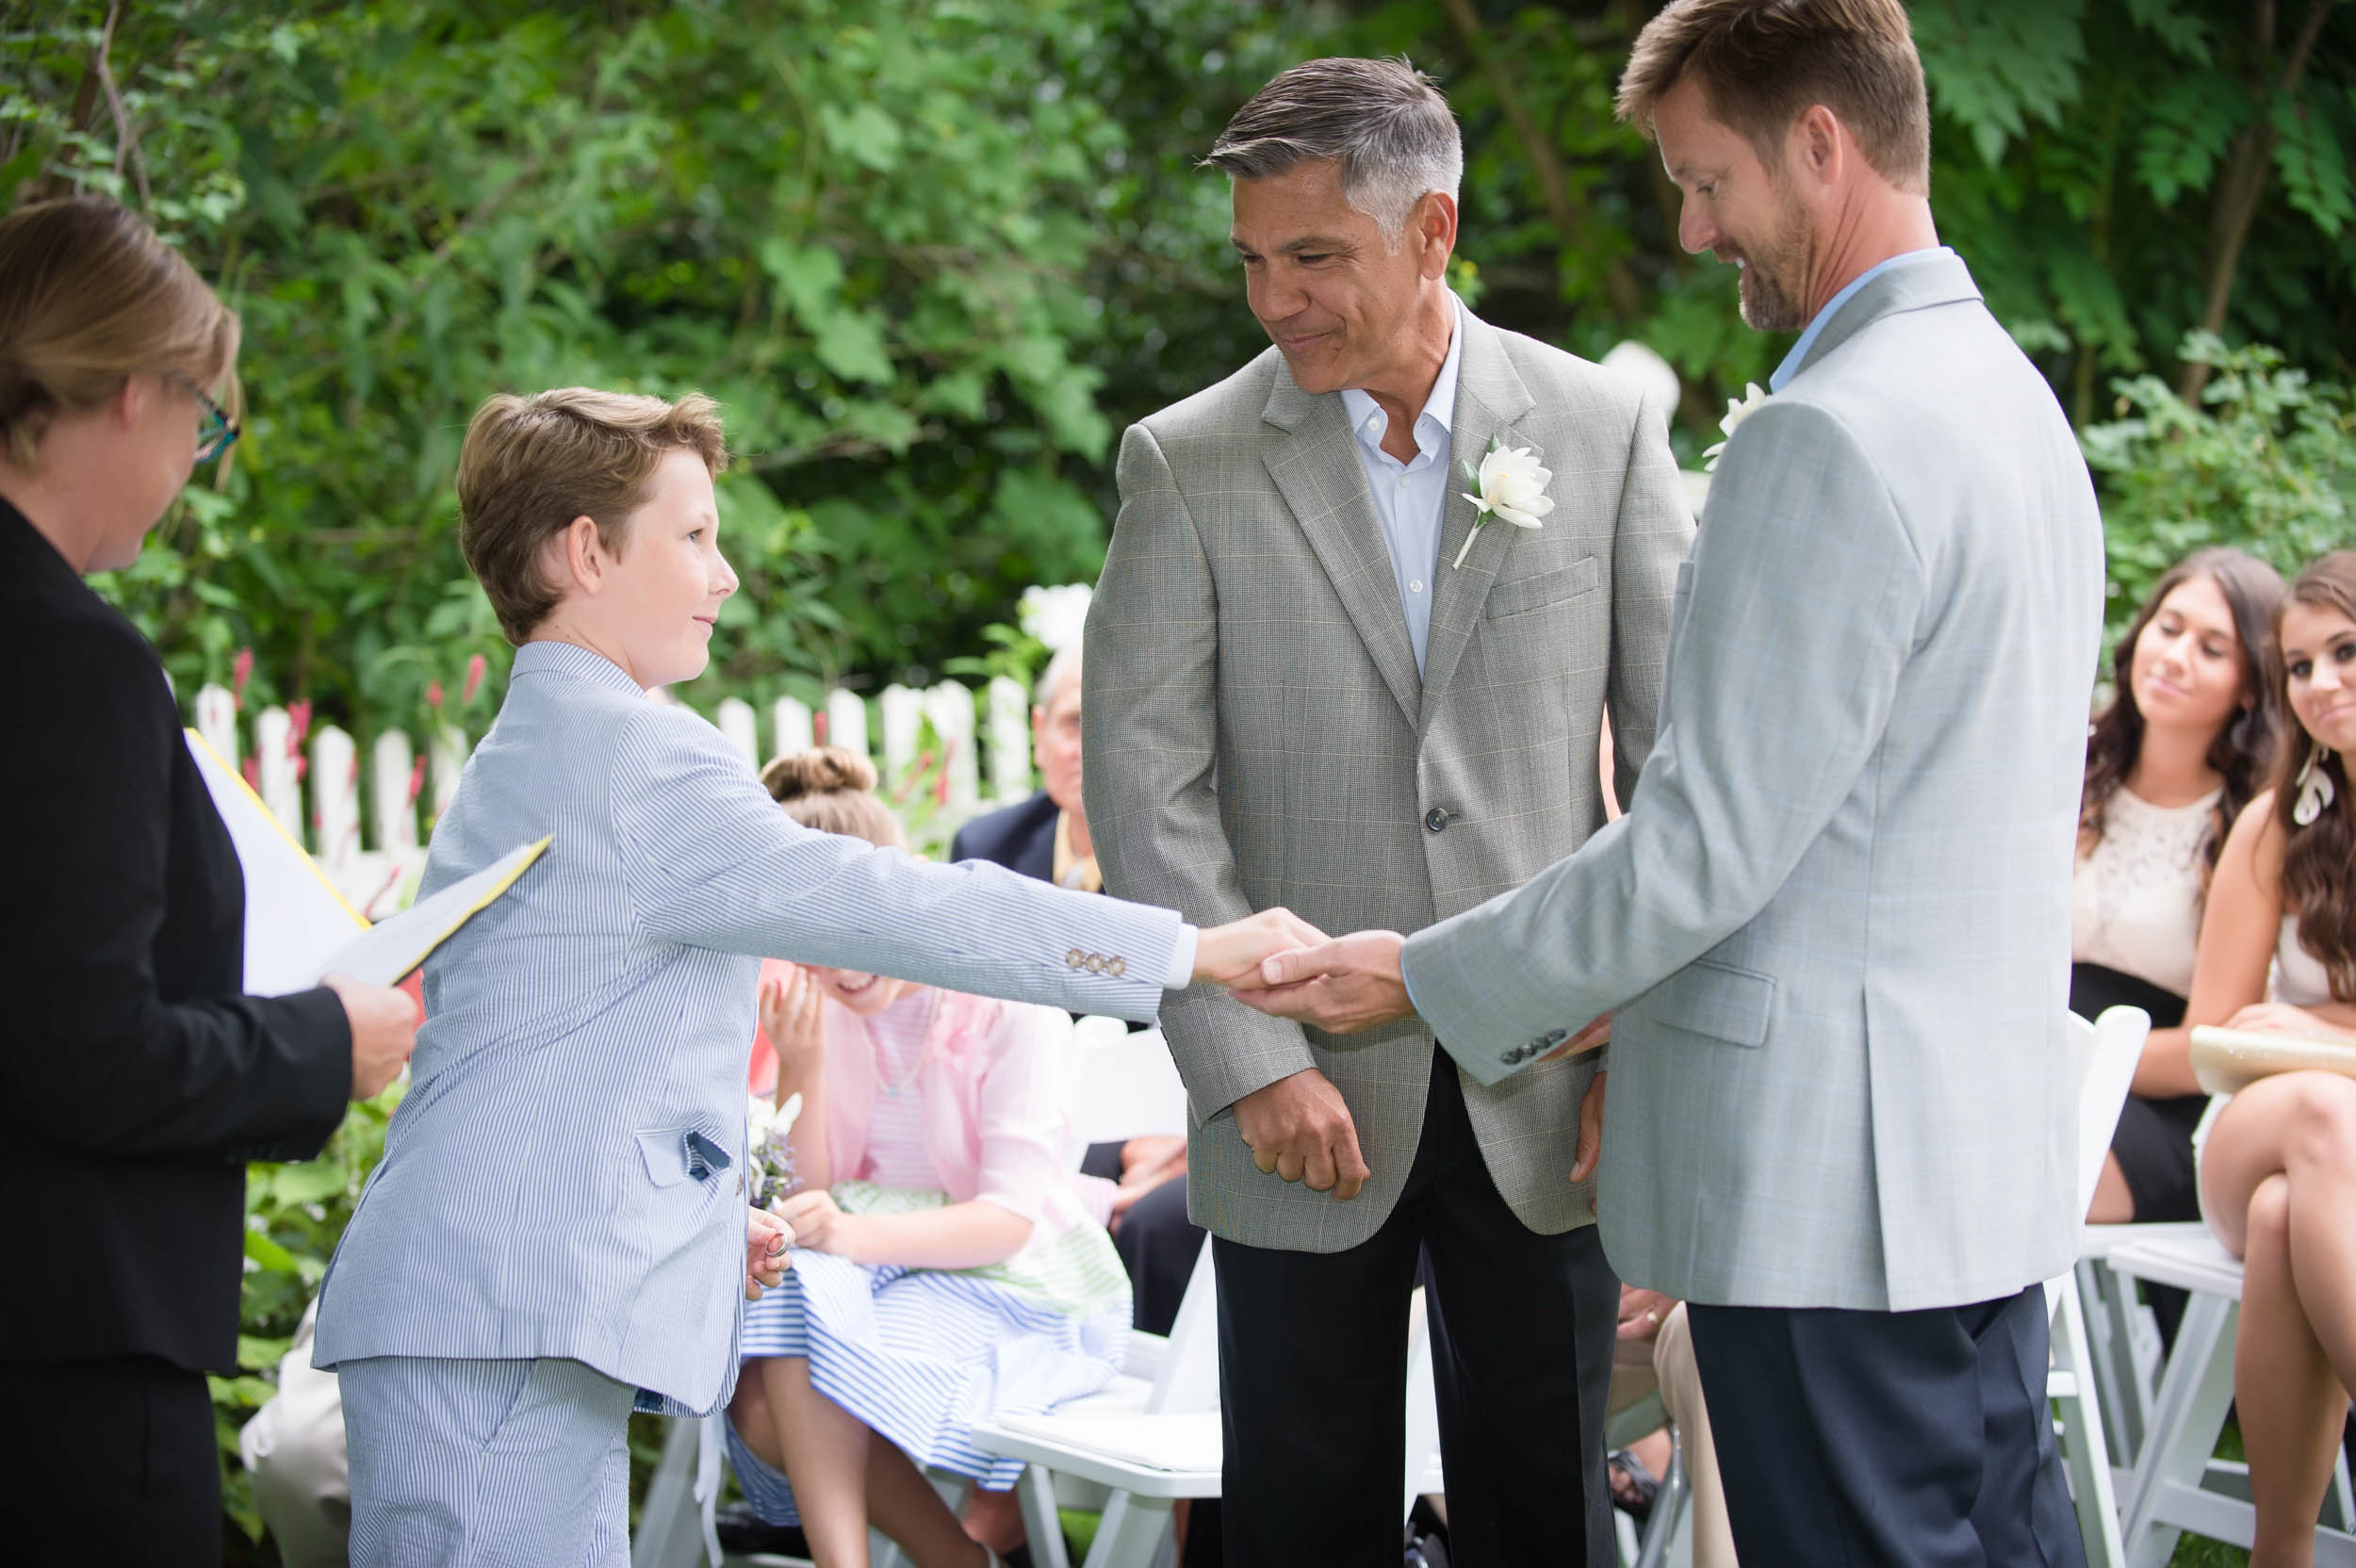 Wedding106BillandChris 314*2-Edit-2.jpg